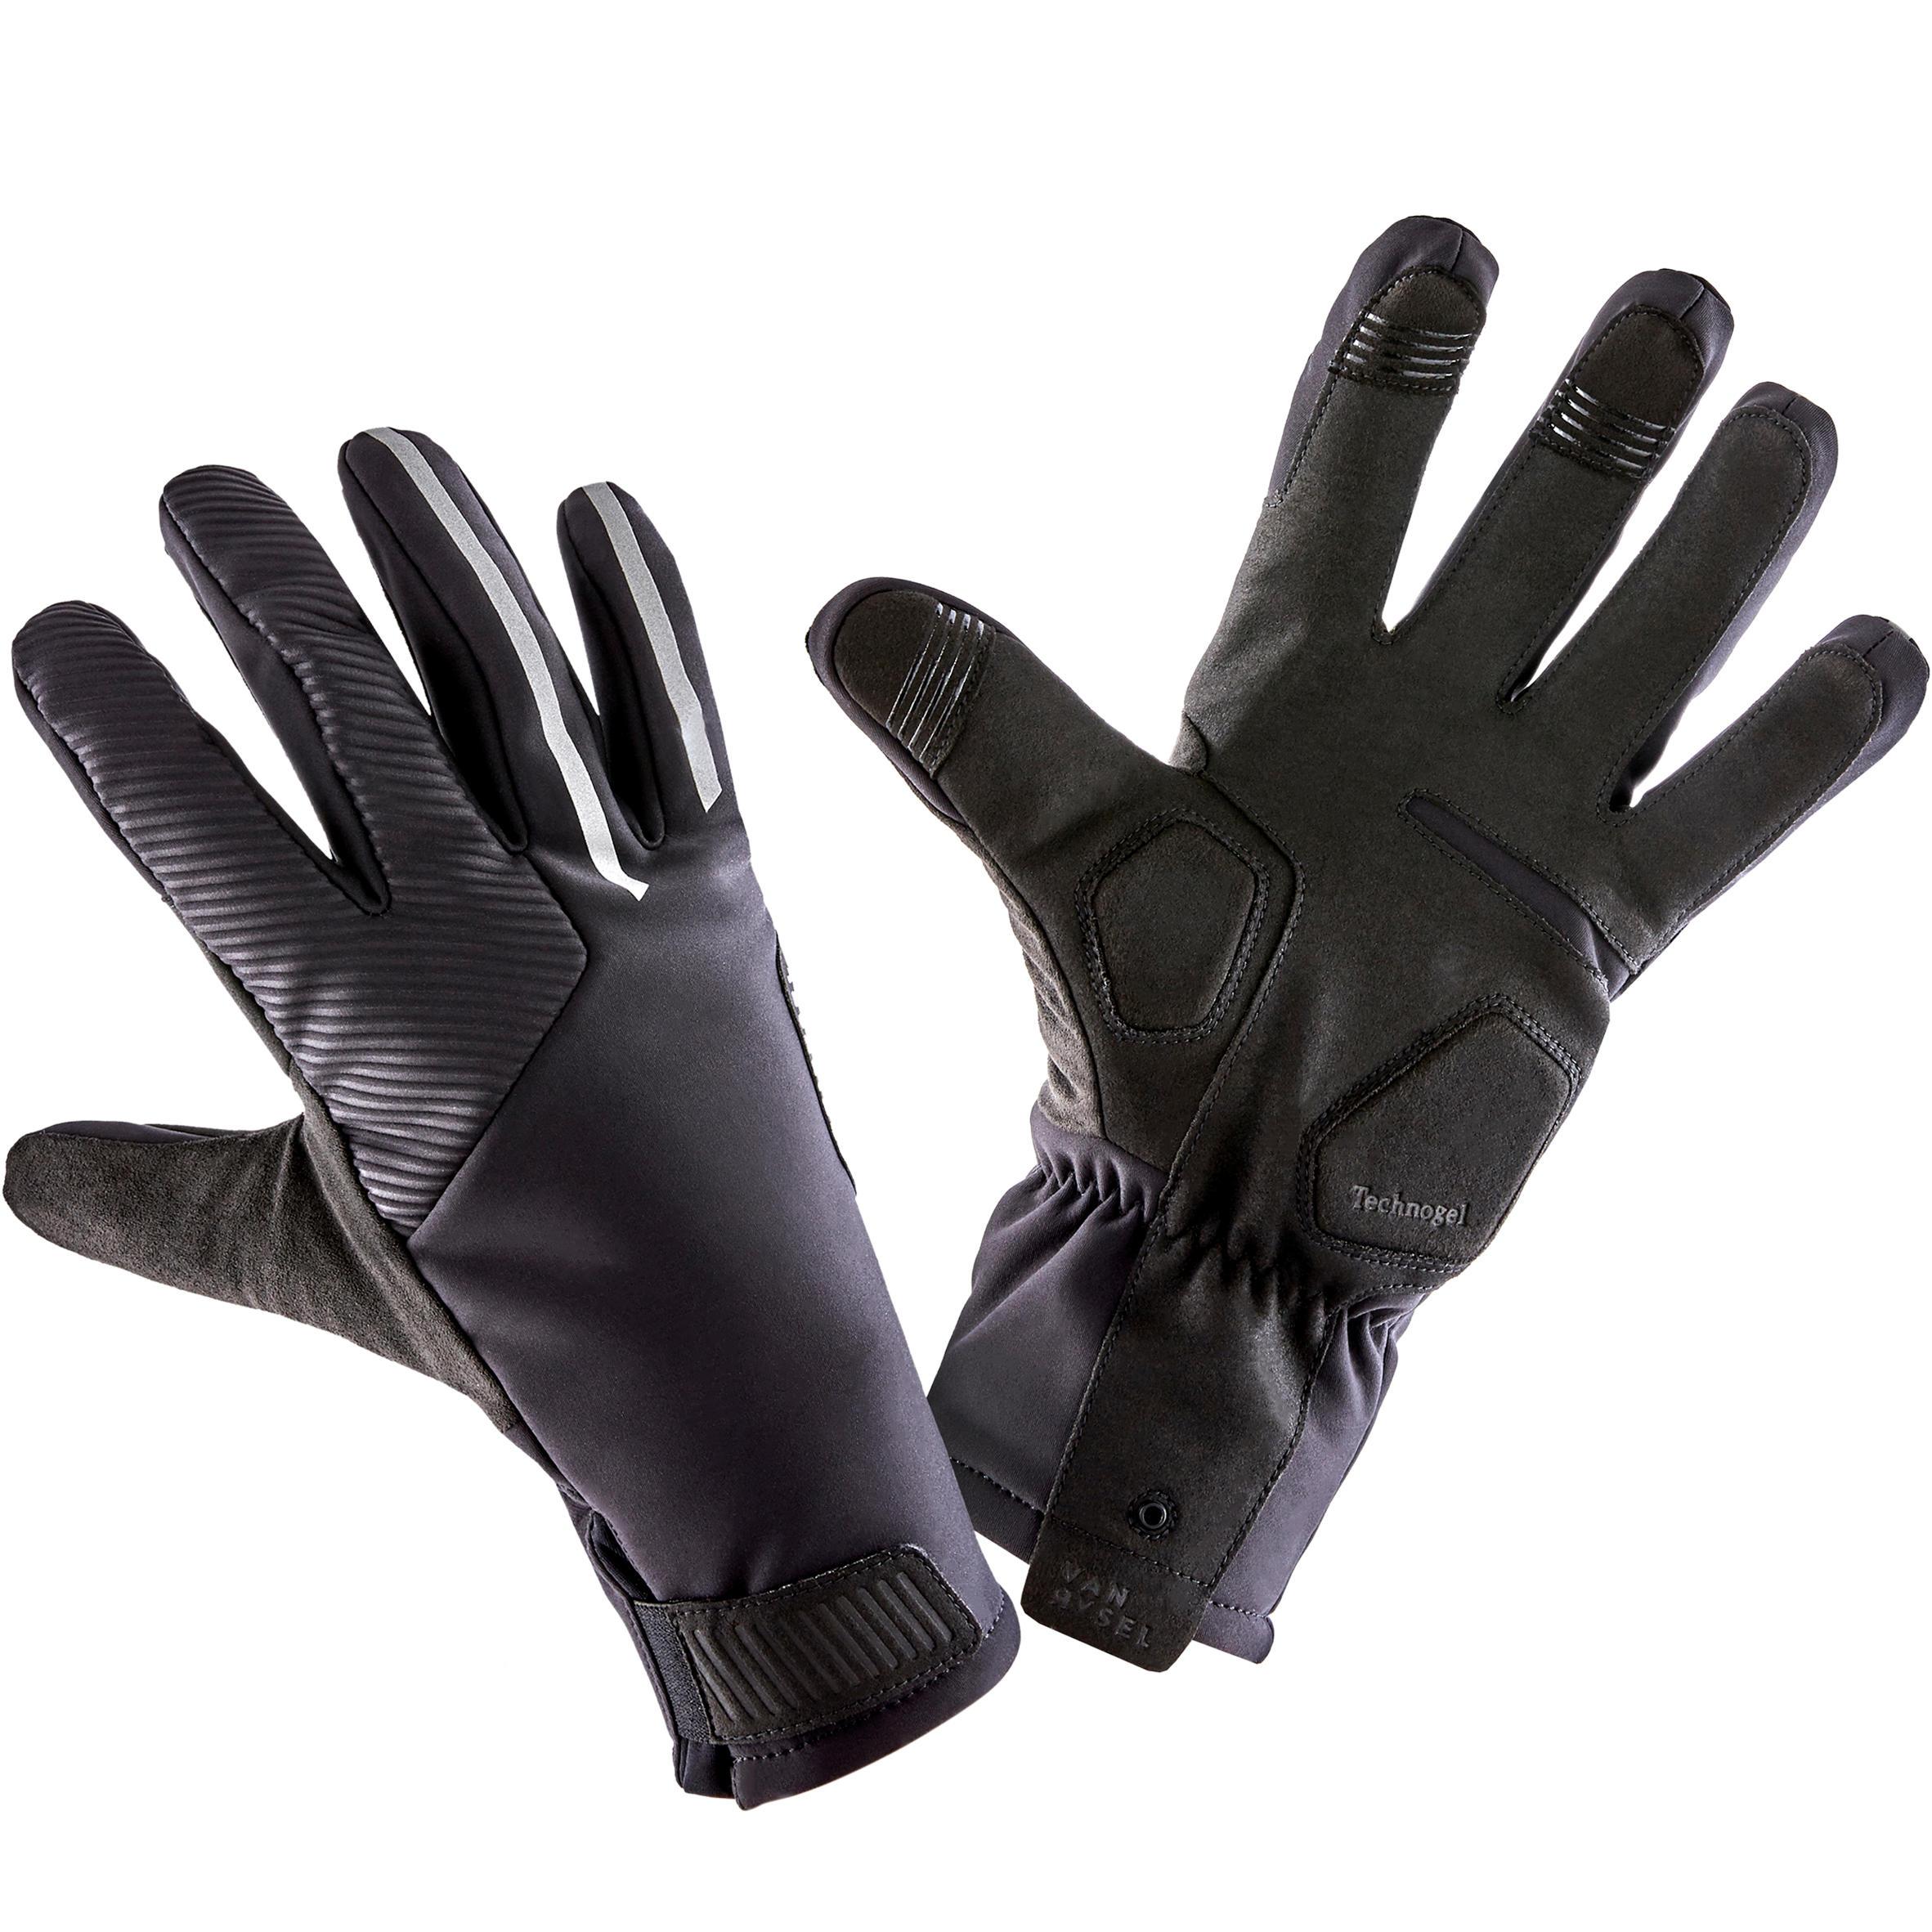 Fauteuil en cuir gants demi doigt nationales fitness sport musculation